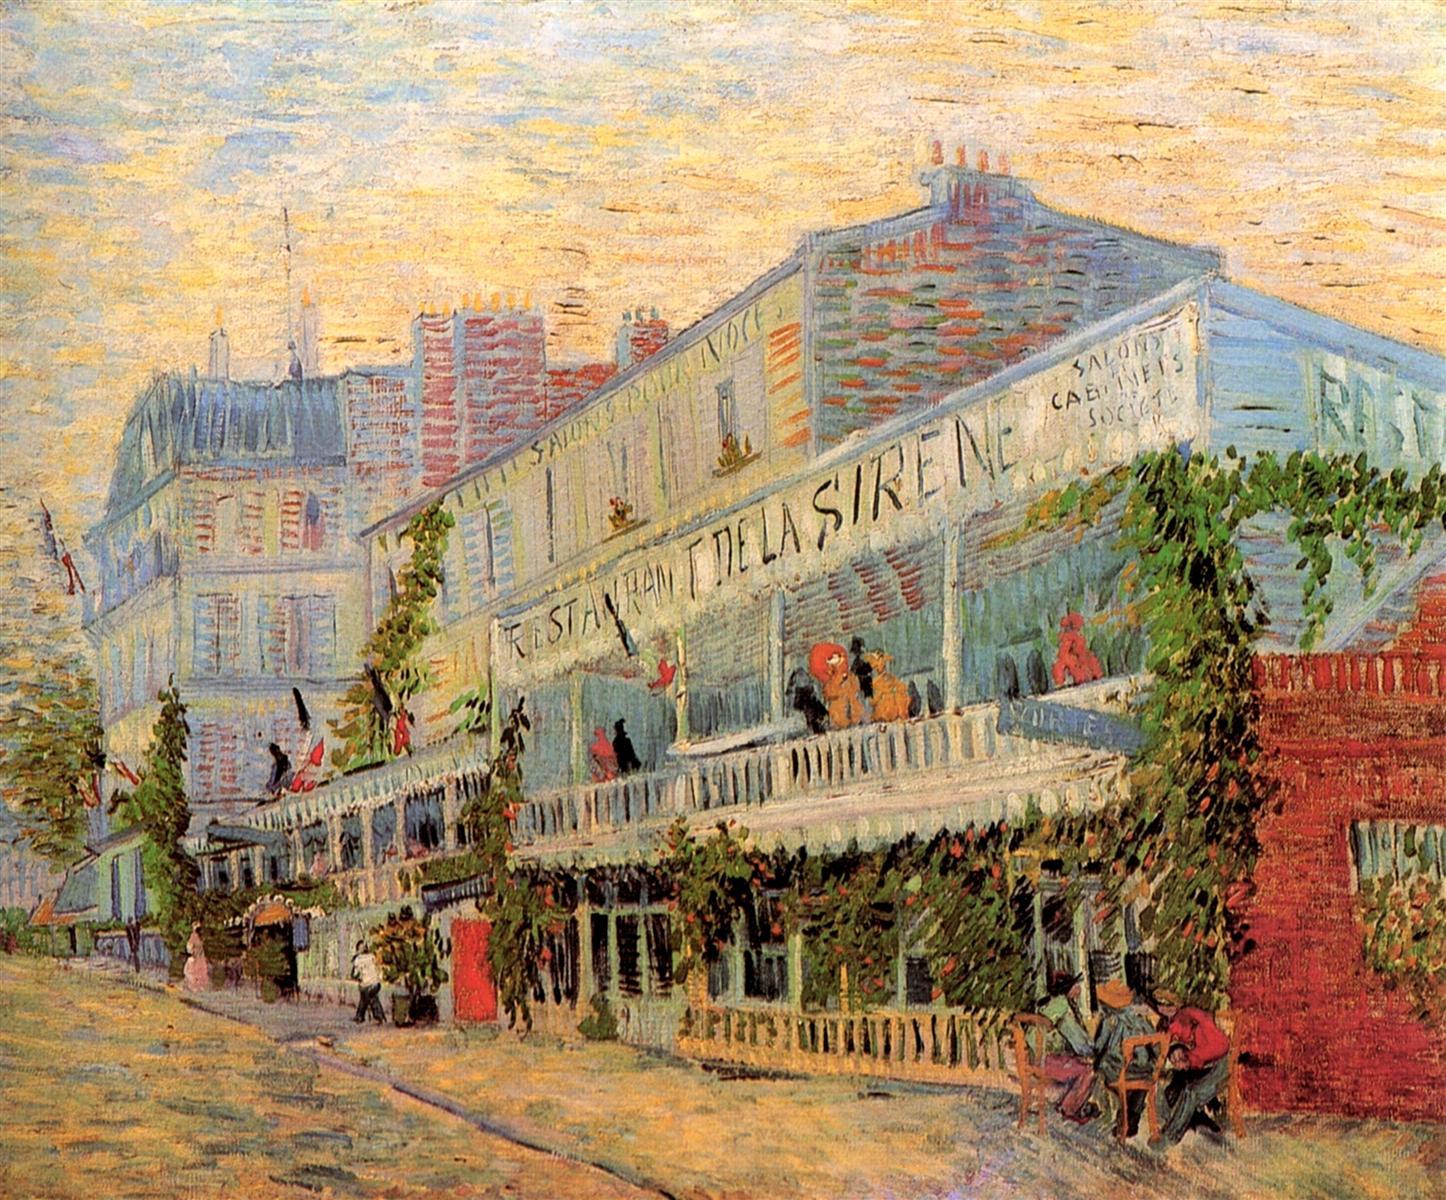 Van Gogh: La Sirene